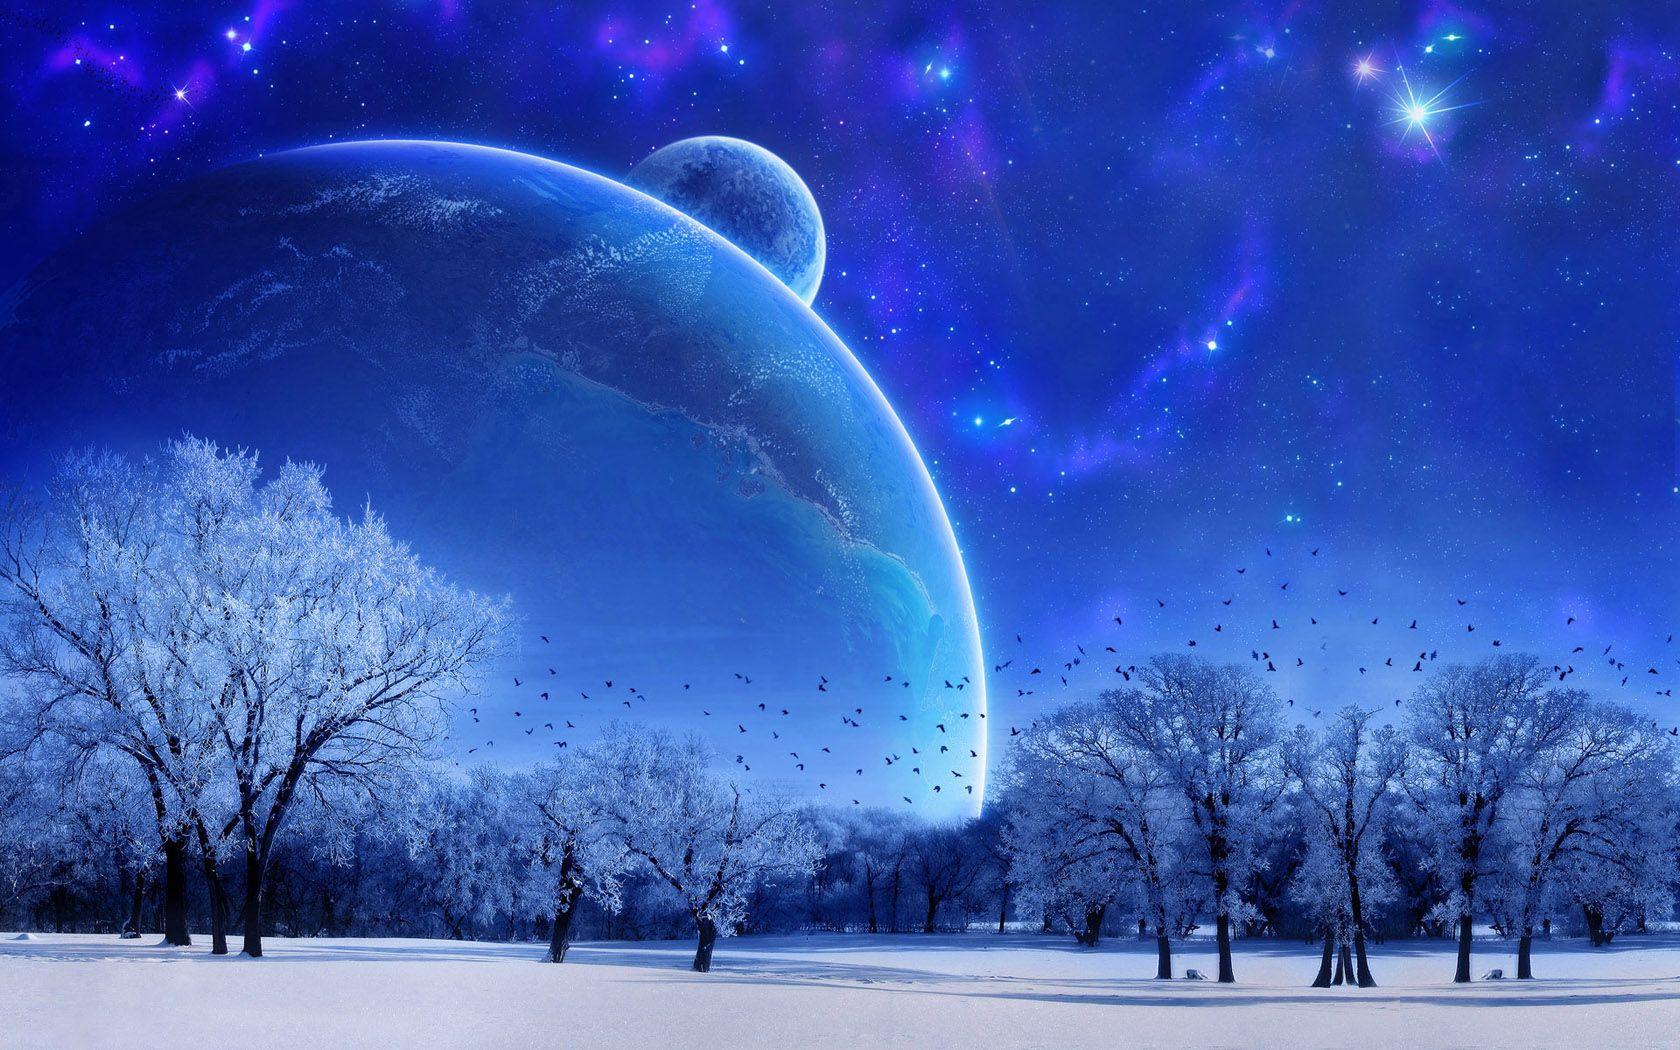 Http Www Pixelstalk Net Wp Content Uploads 2016 04 Lake Night Moon Mountains Wallpapers 1920x1080 Jpg Night Landscape Mountain Wallpaper Landscape